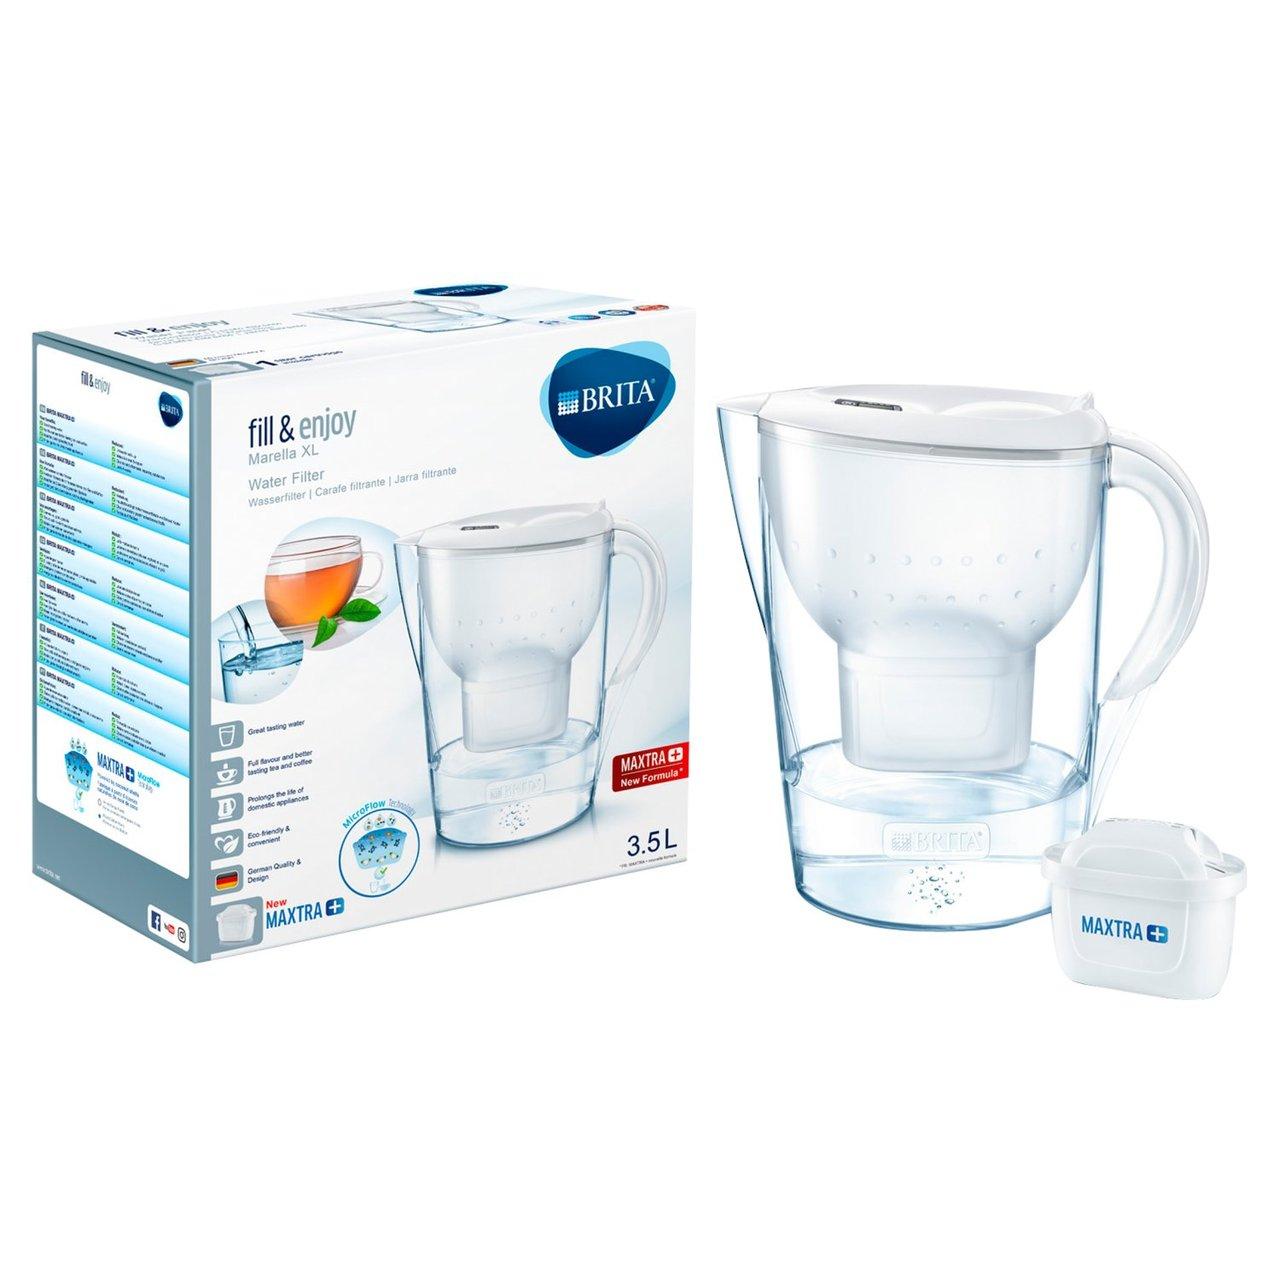 Ocado Brita Maxtra+ Marella XL Water Filter Jug 3.5L with 1 cartridge - £12.65